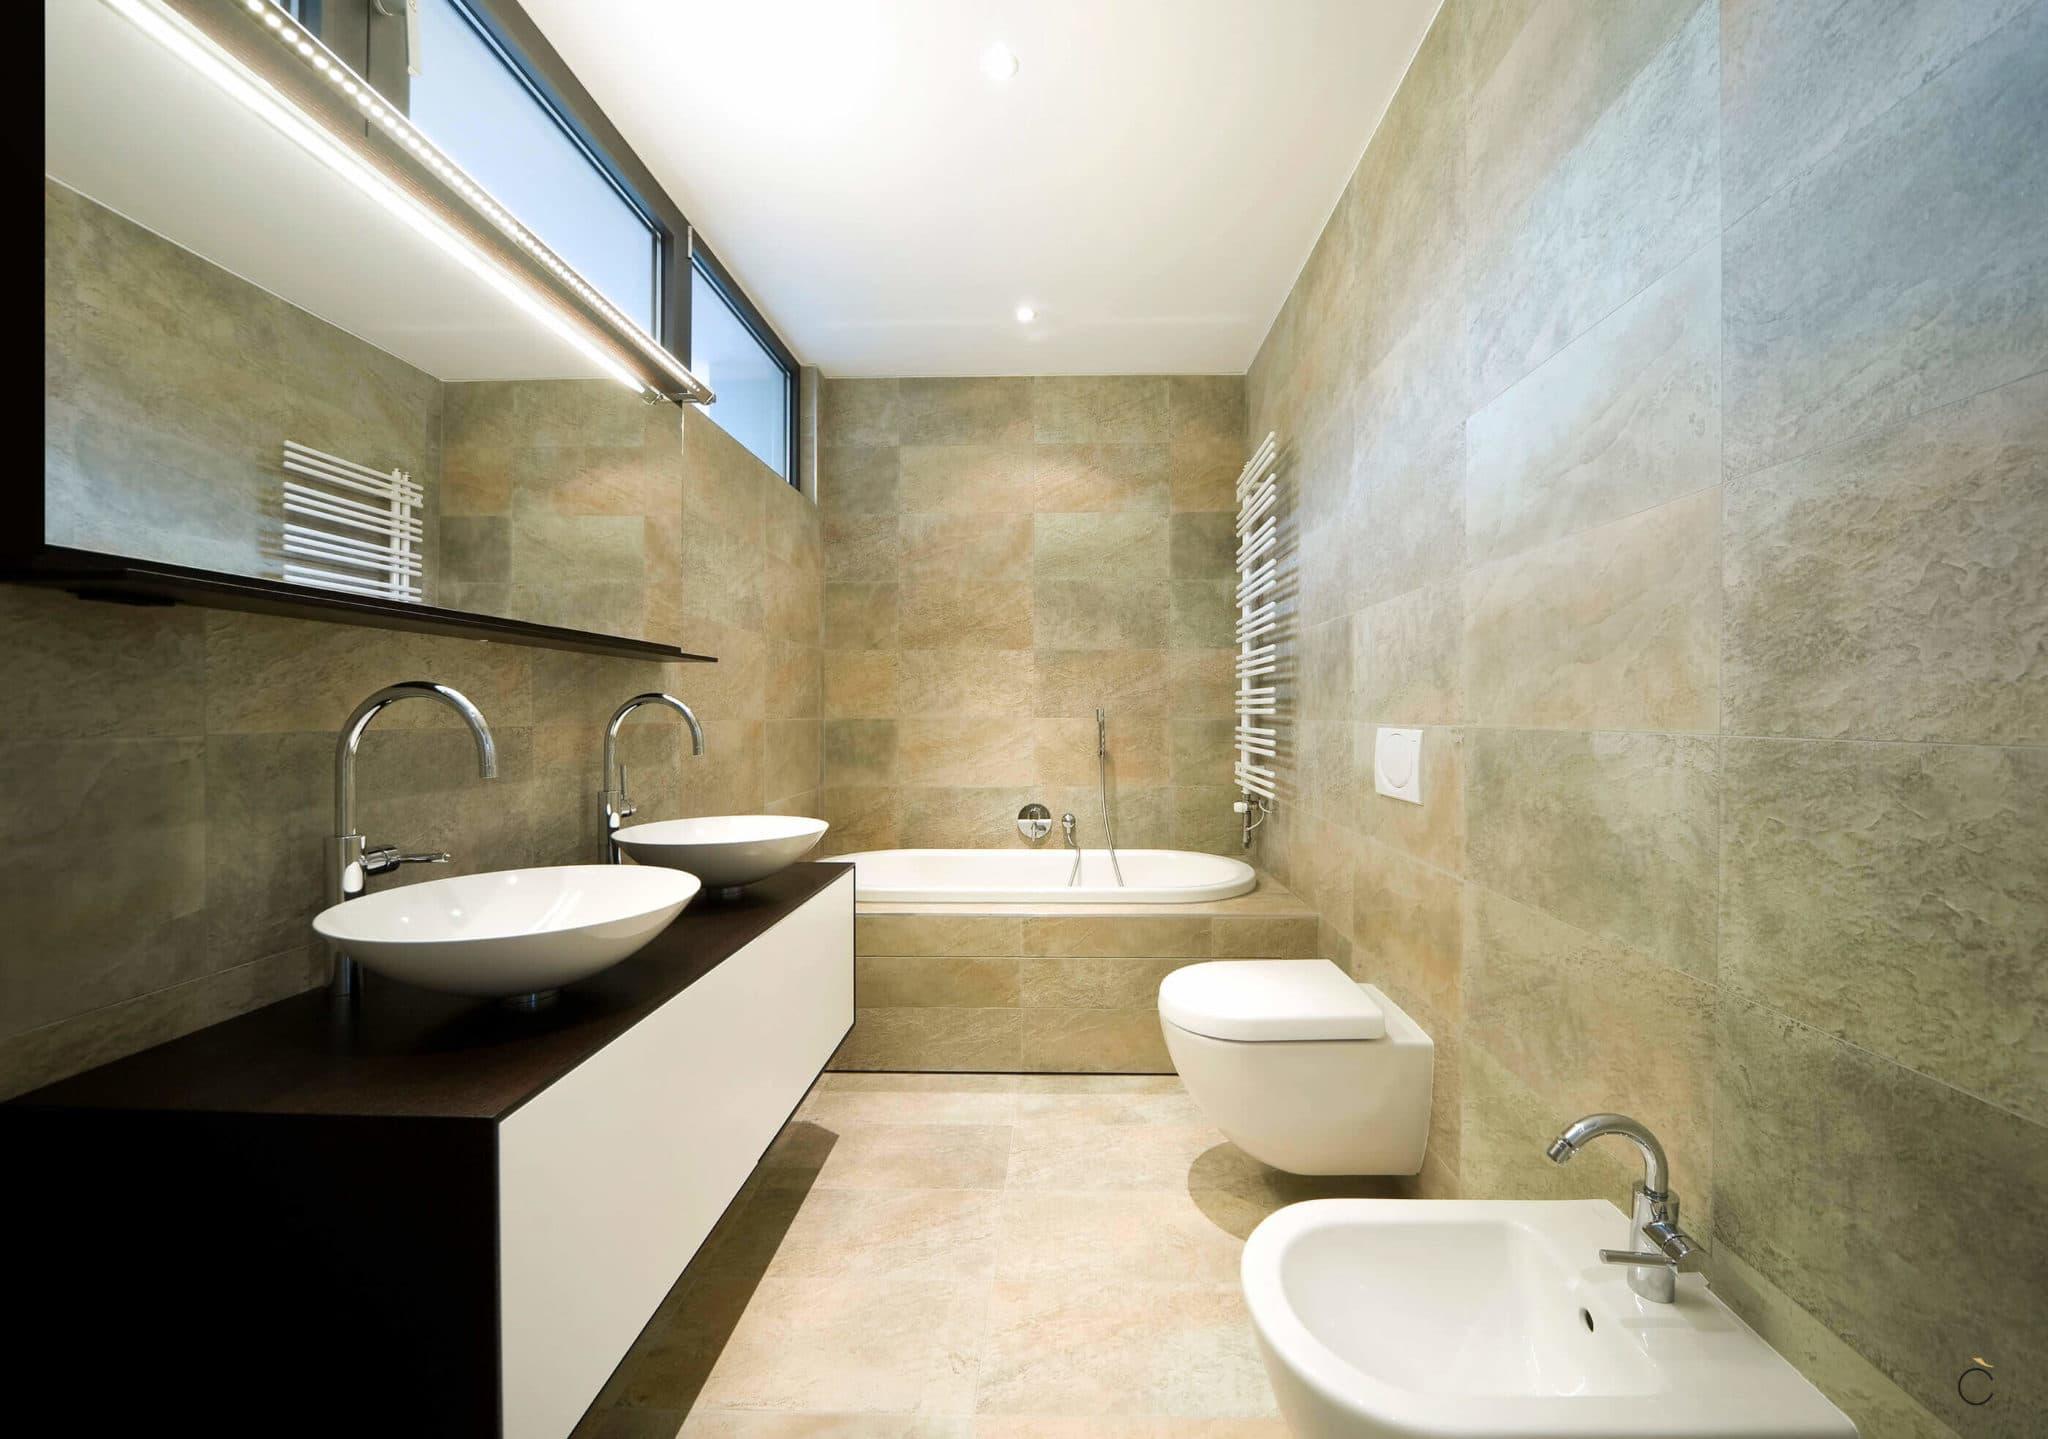 Baño de diseño con bañera